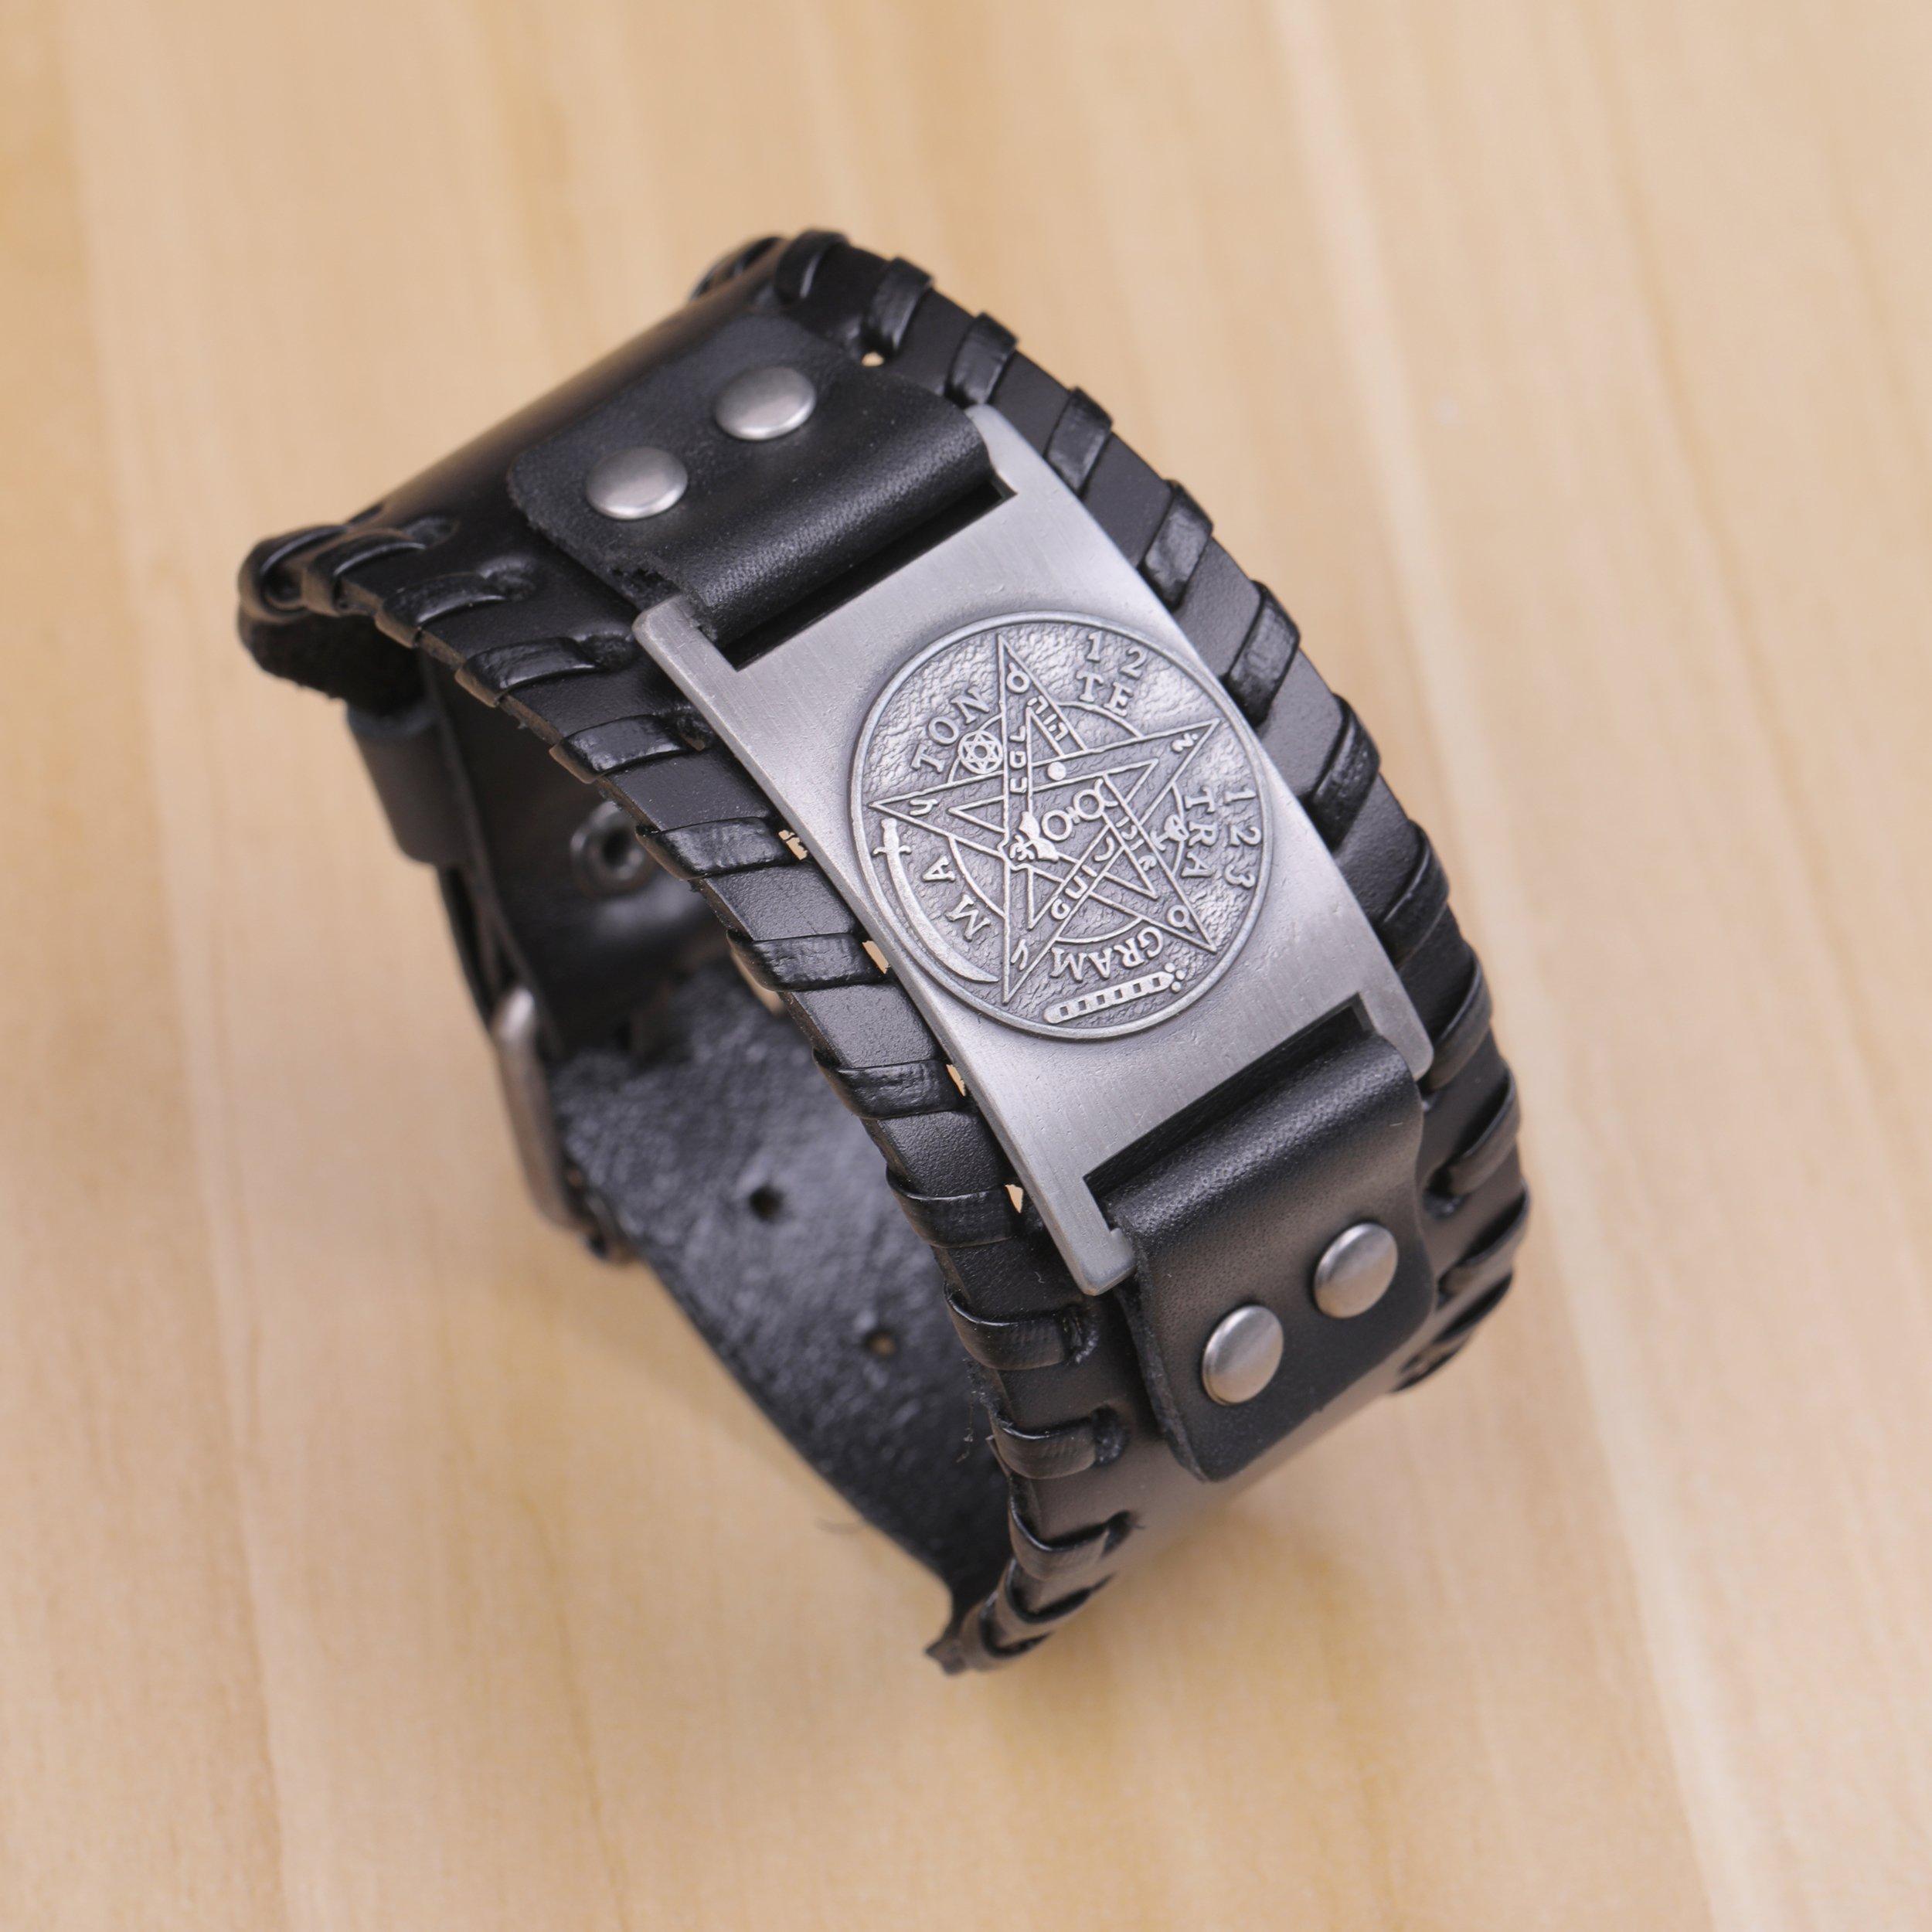 Pagan Viking Tetragrammaton Pentacle Symbol Talisman for Love Braided Wide Leather Wristband Bracelet (Antique Silver,Black) by Skyrim (Image #4)